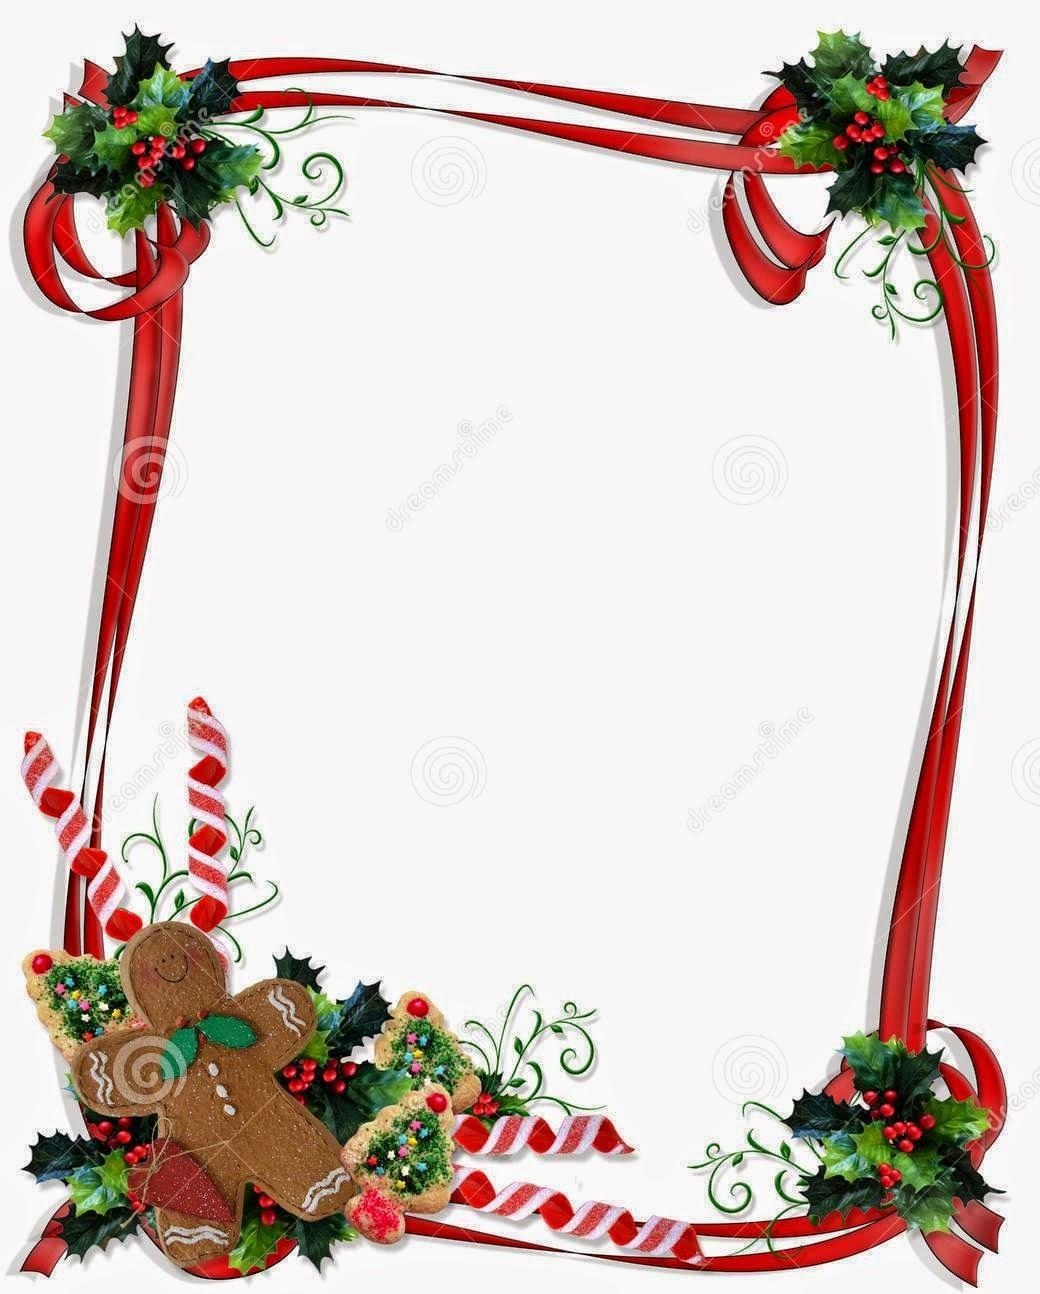 Free Printable Christmas Clip Art & Look At Clip Art Images - Free Printable Christmas Clip Art